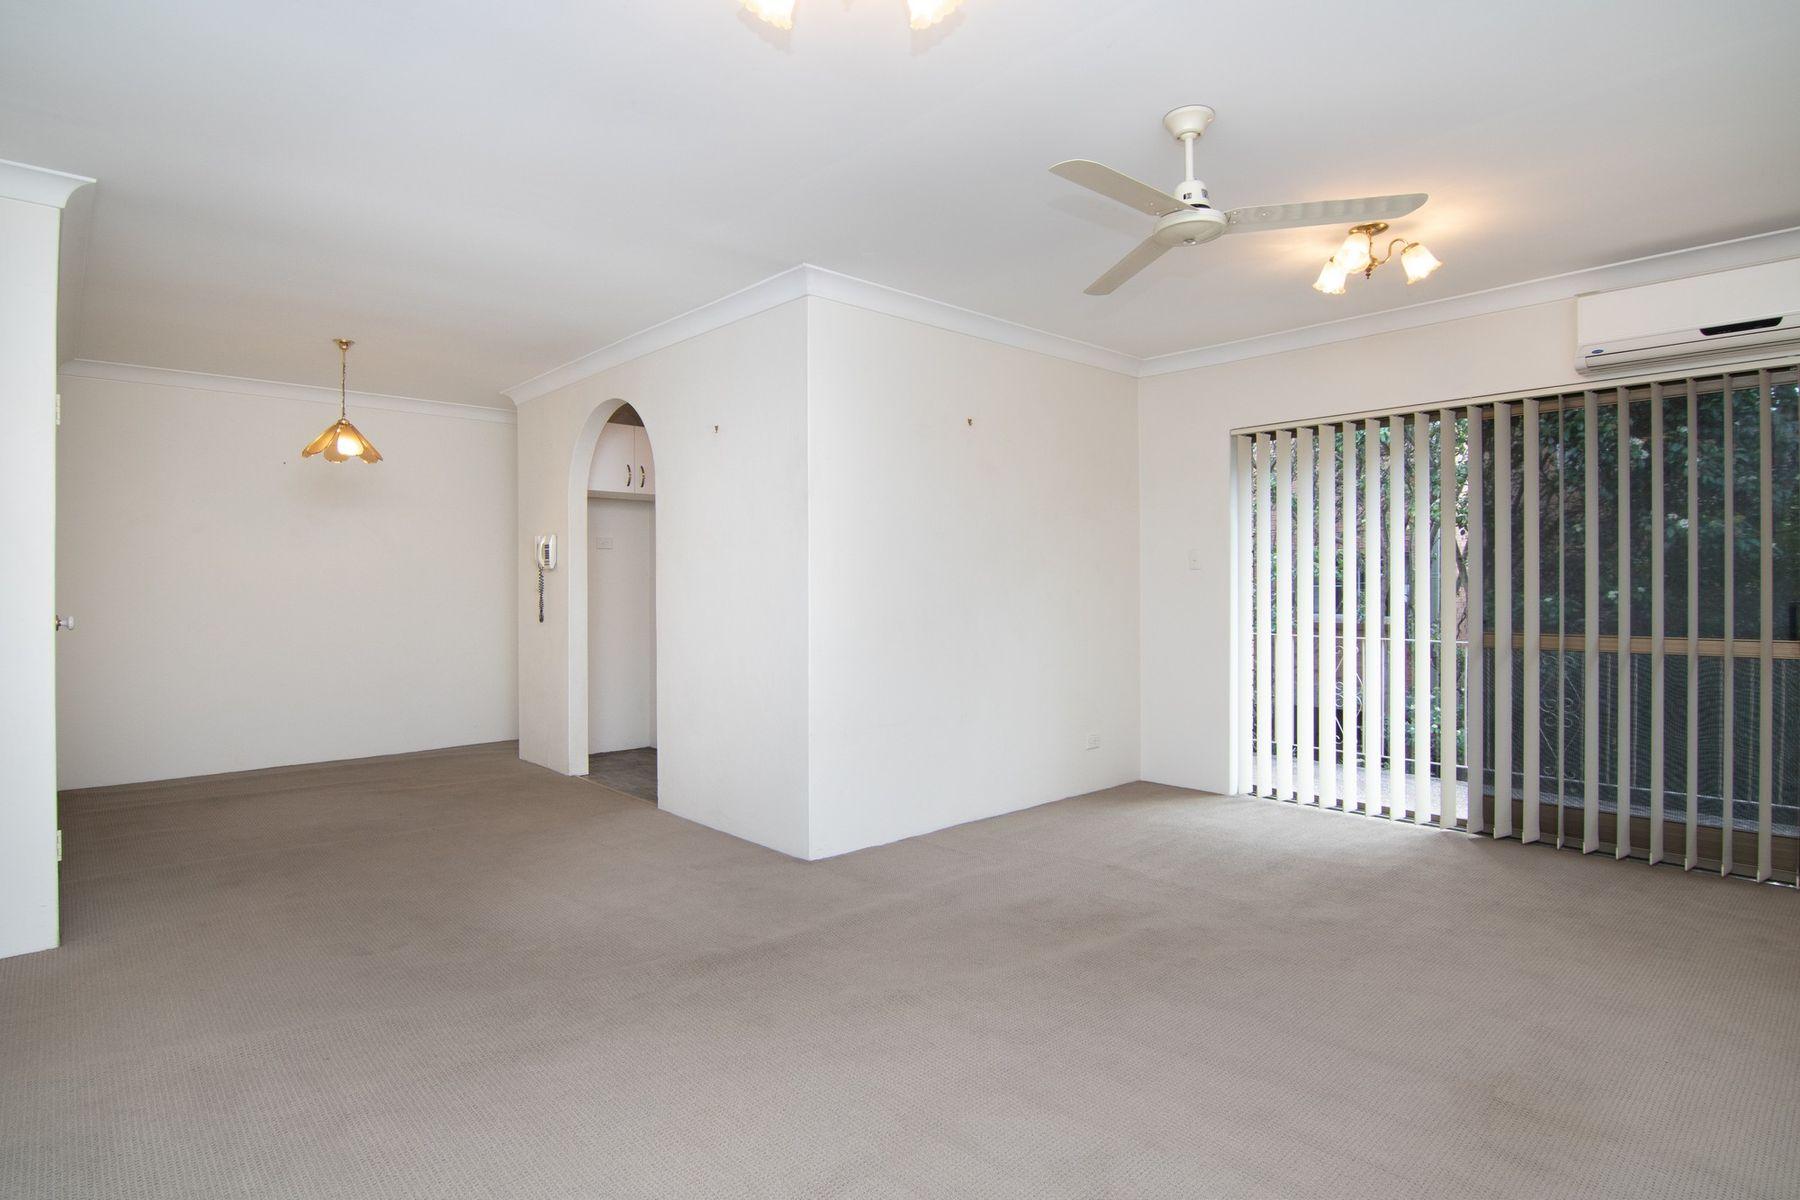 3/7 Hemming Street, Penrith, NSW 2750